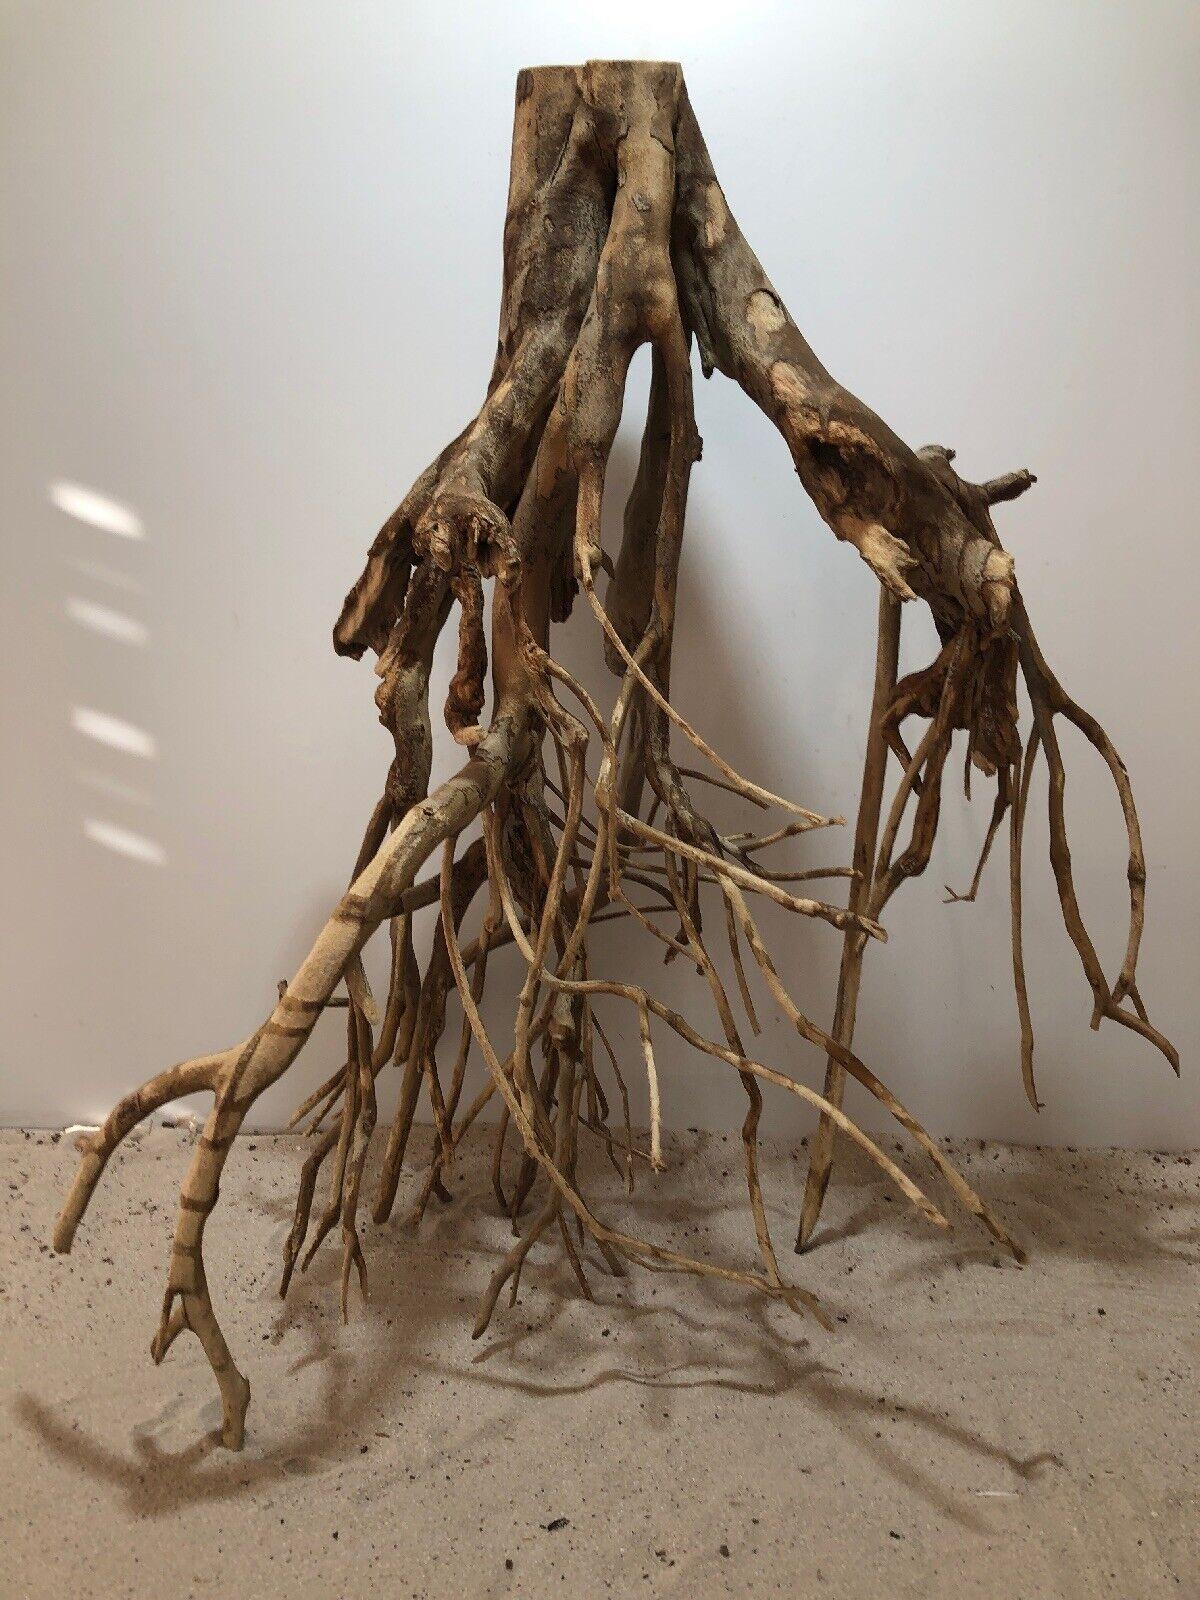 Talawa Wurzel ähnlich rote Moorwurzel, Moorkien,Mangrove  1088 63x30x73cm